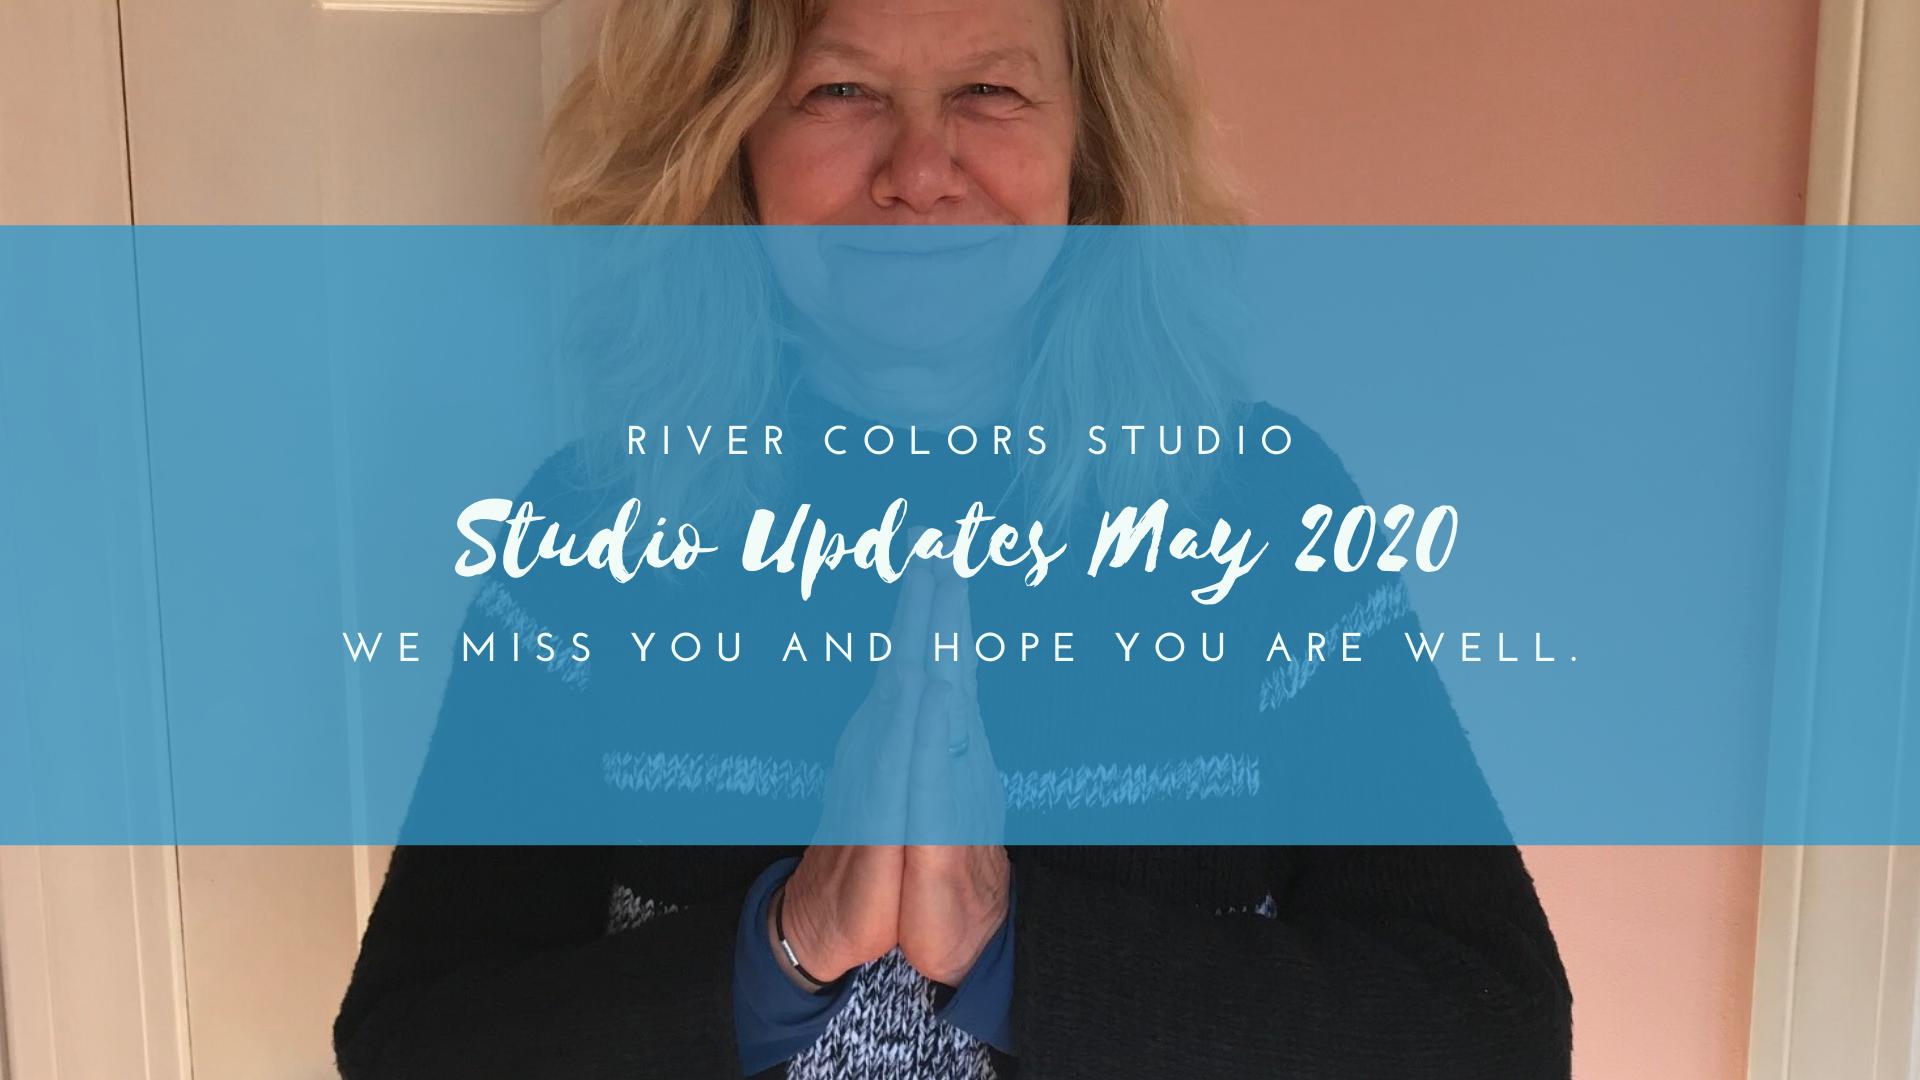 Studio Updates for May 2020